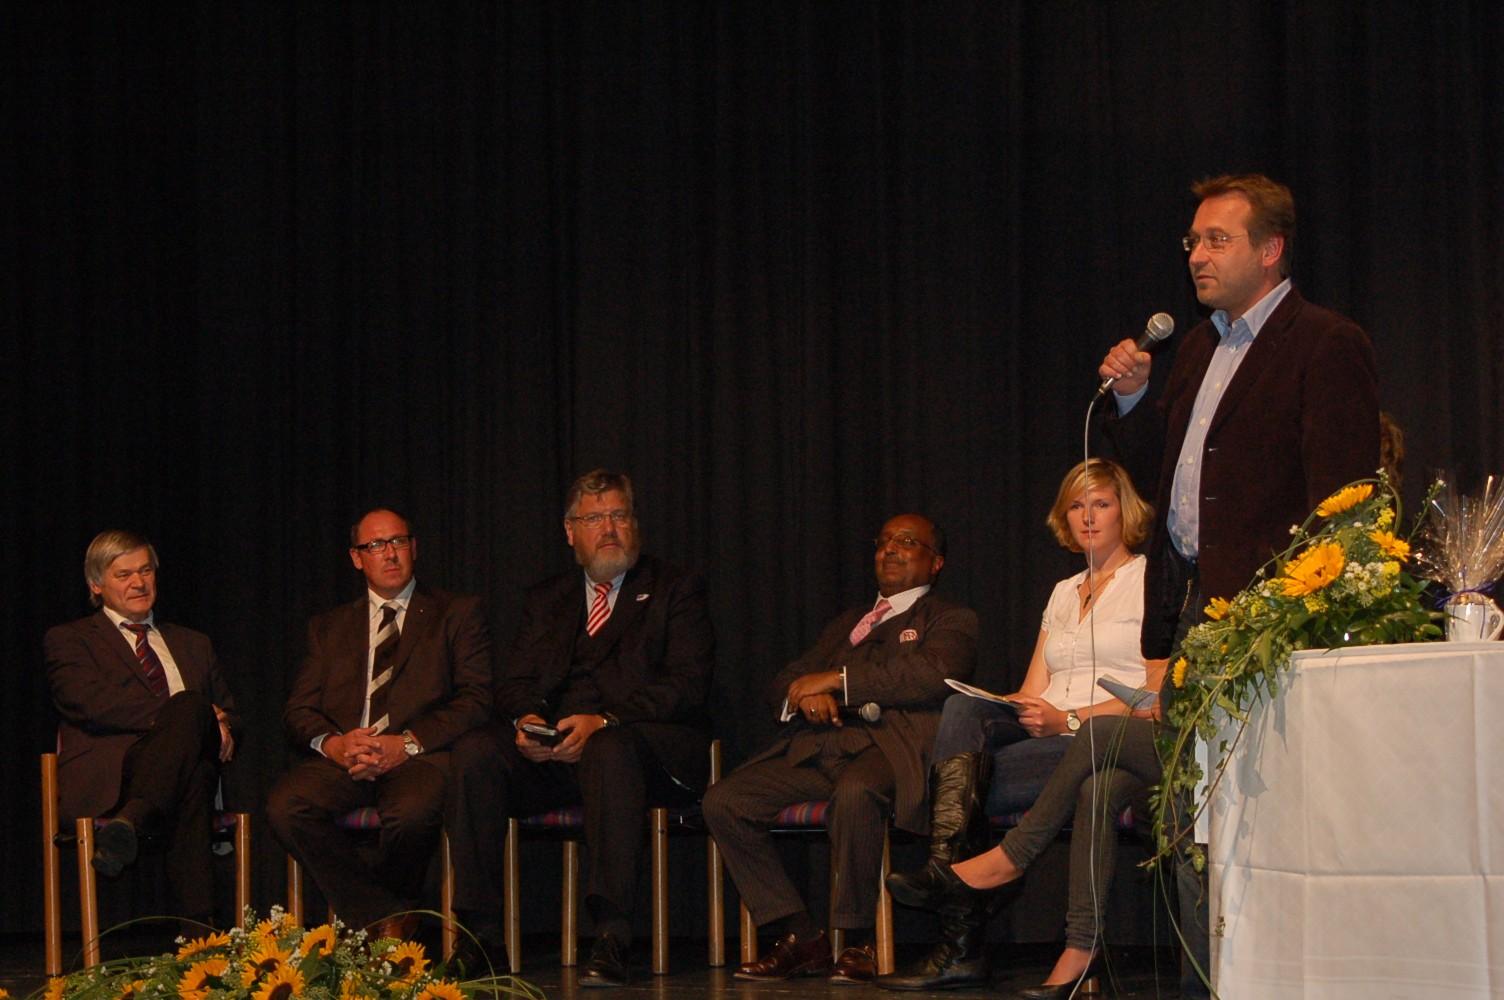 2010:  Vortrag Dr. Asfa-Wossen Asserate